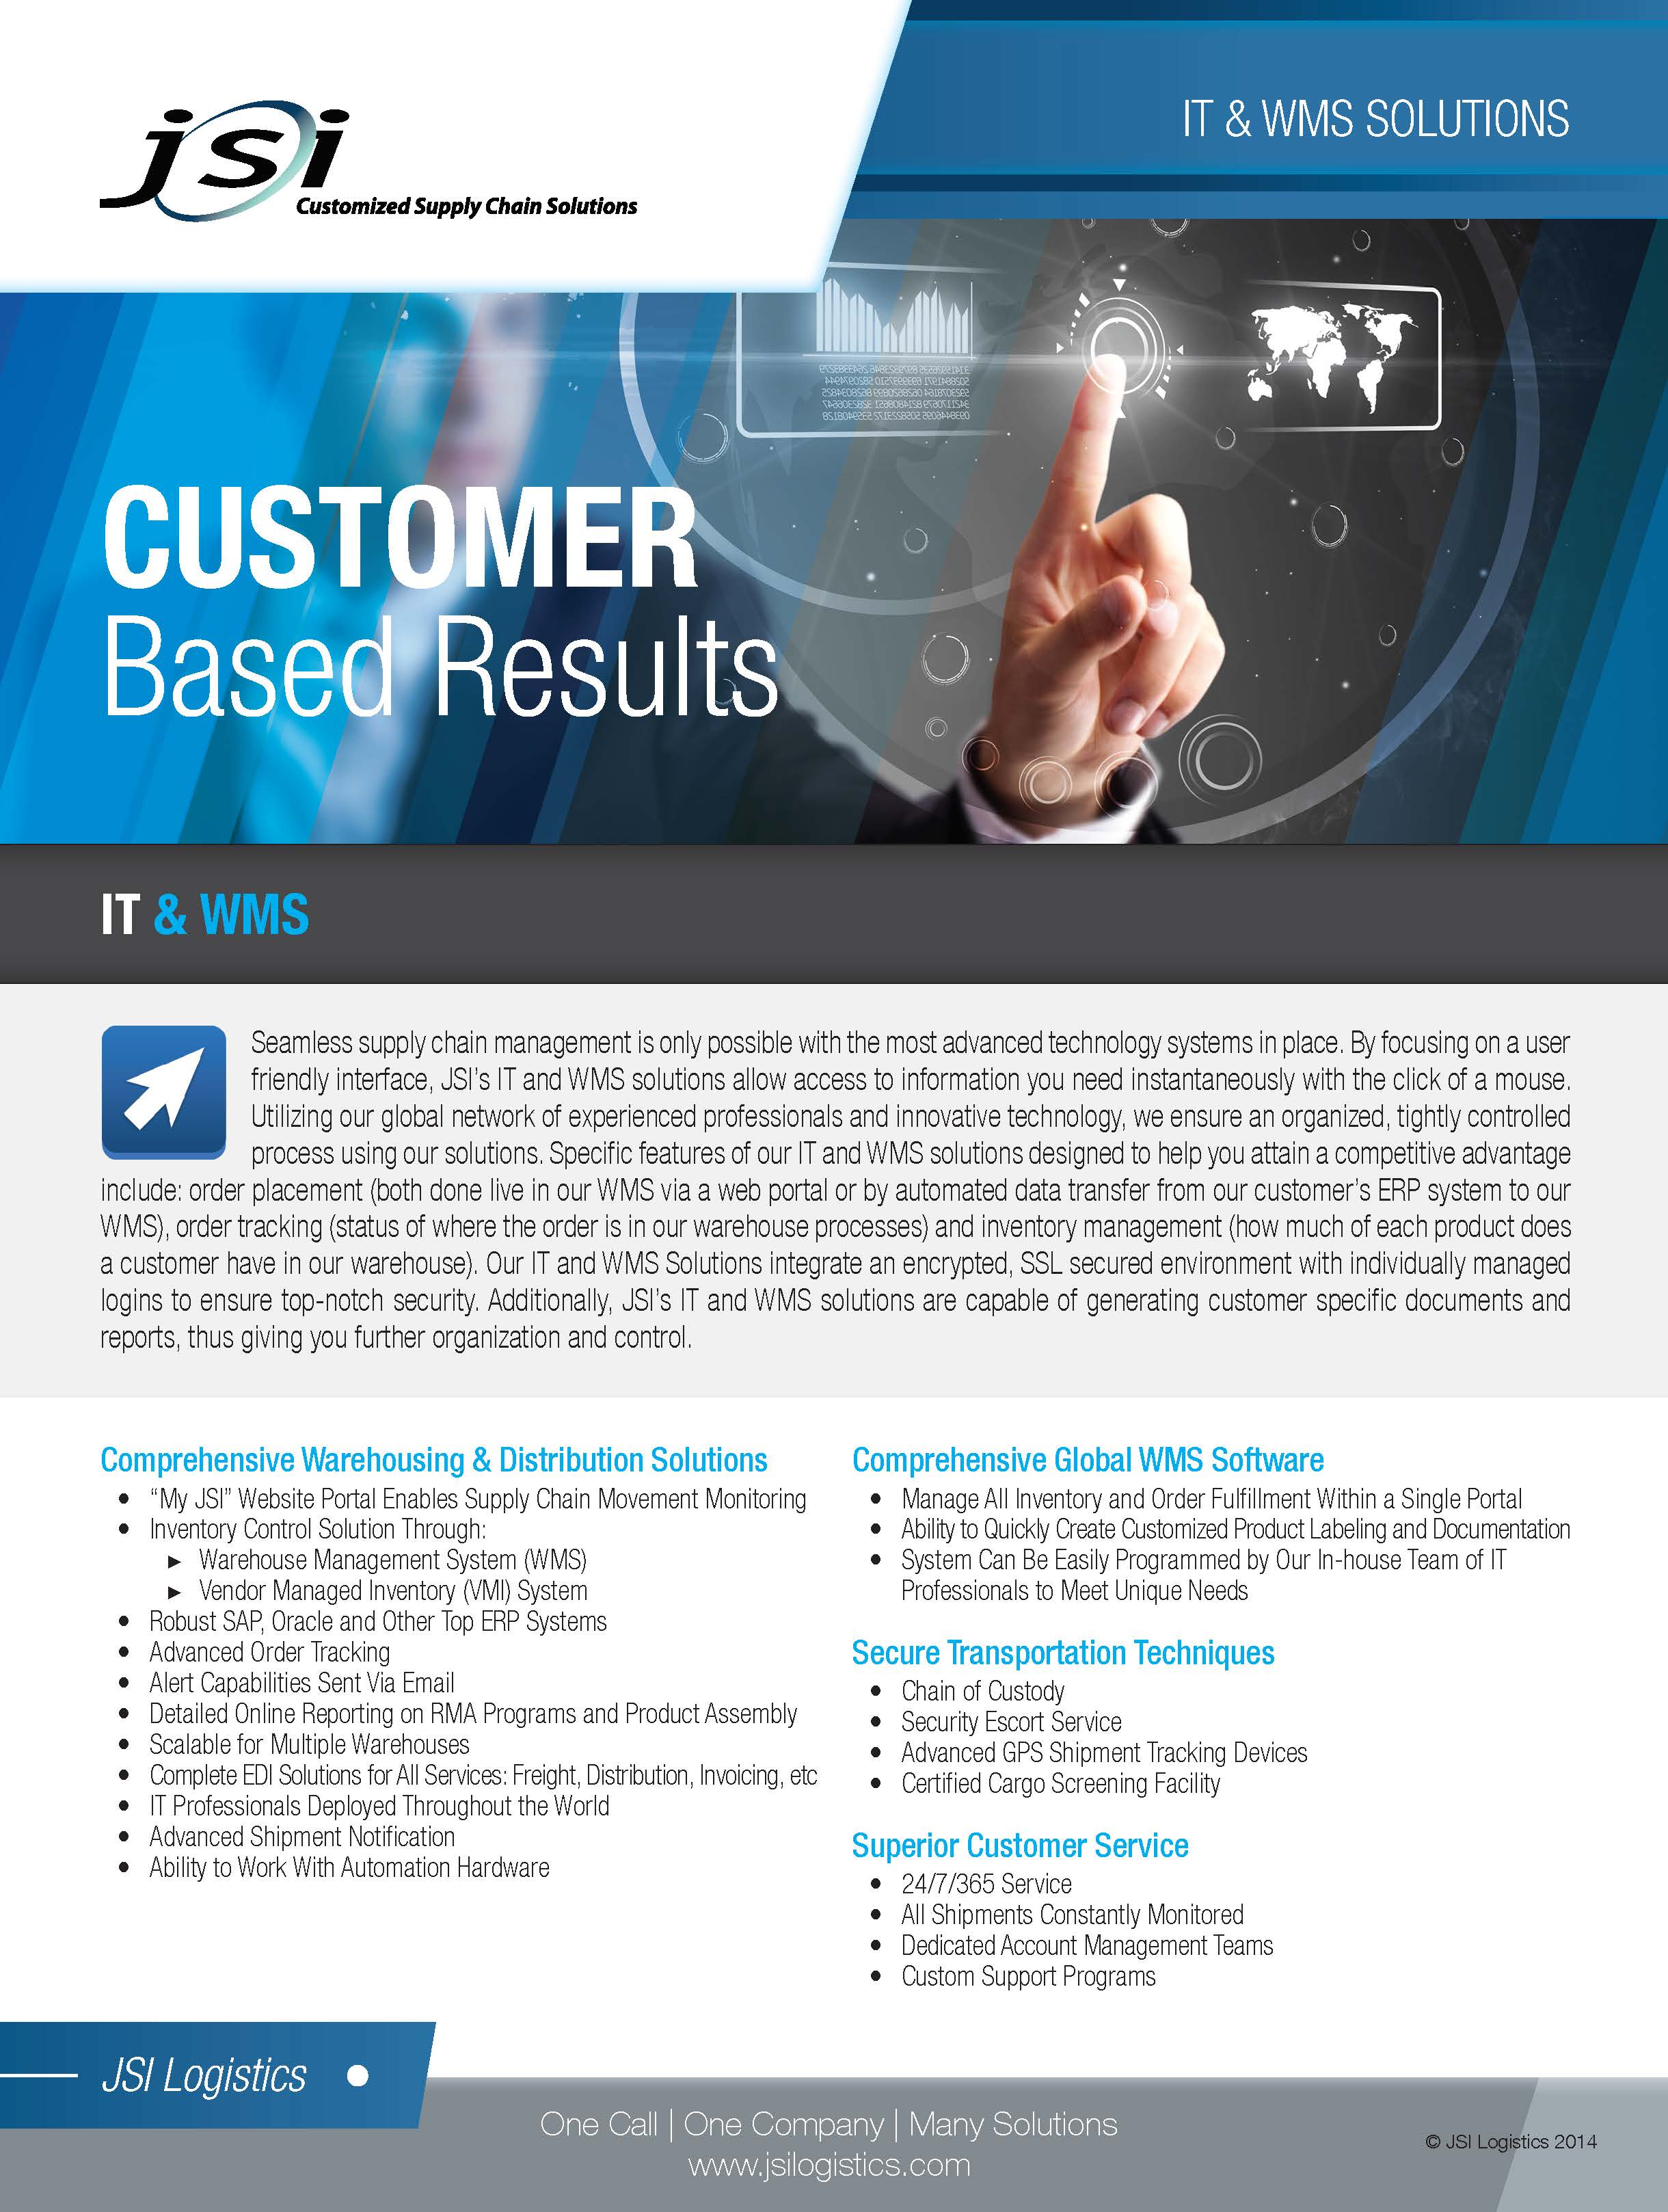 IT & WMS Solutions Flyer